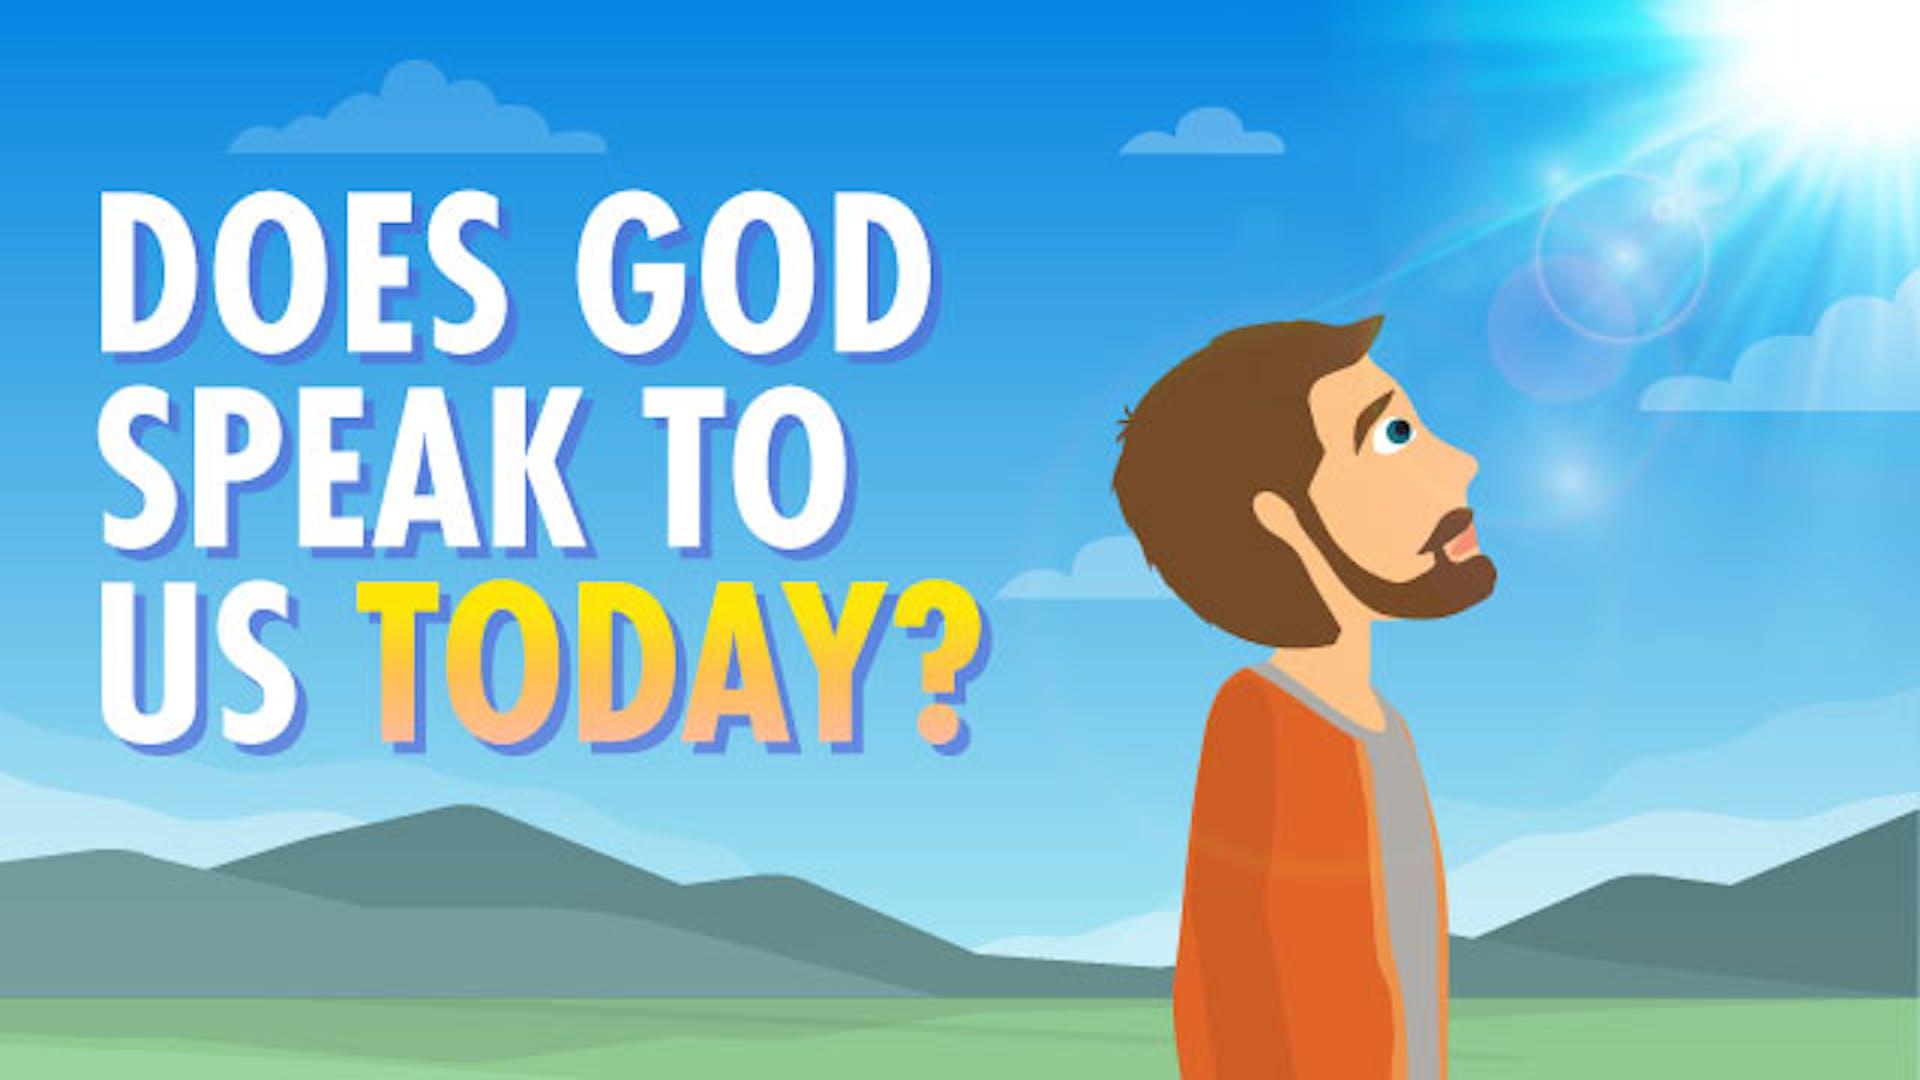 Does God speak to us in dreams